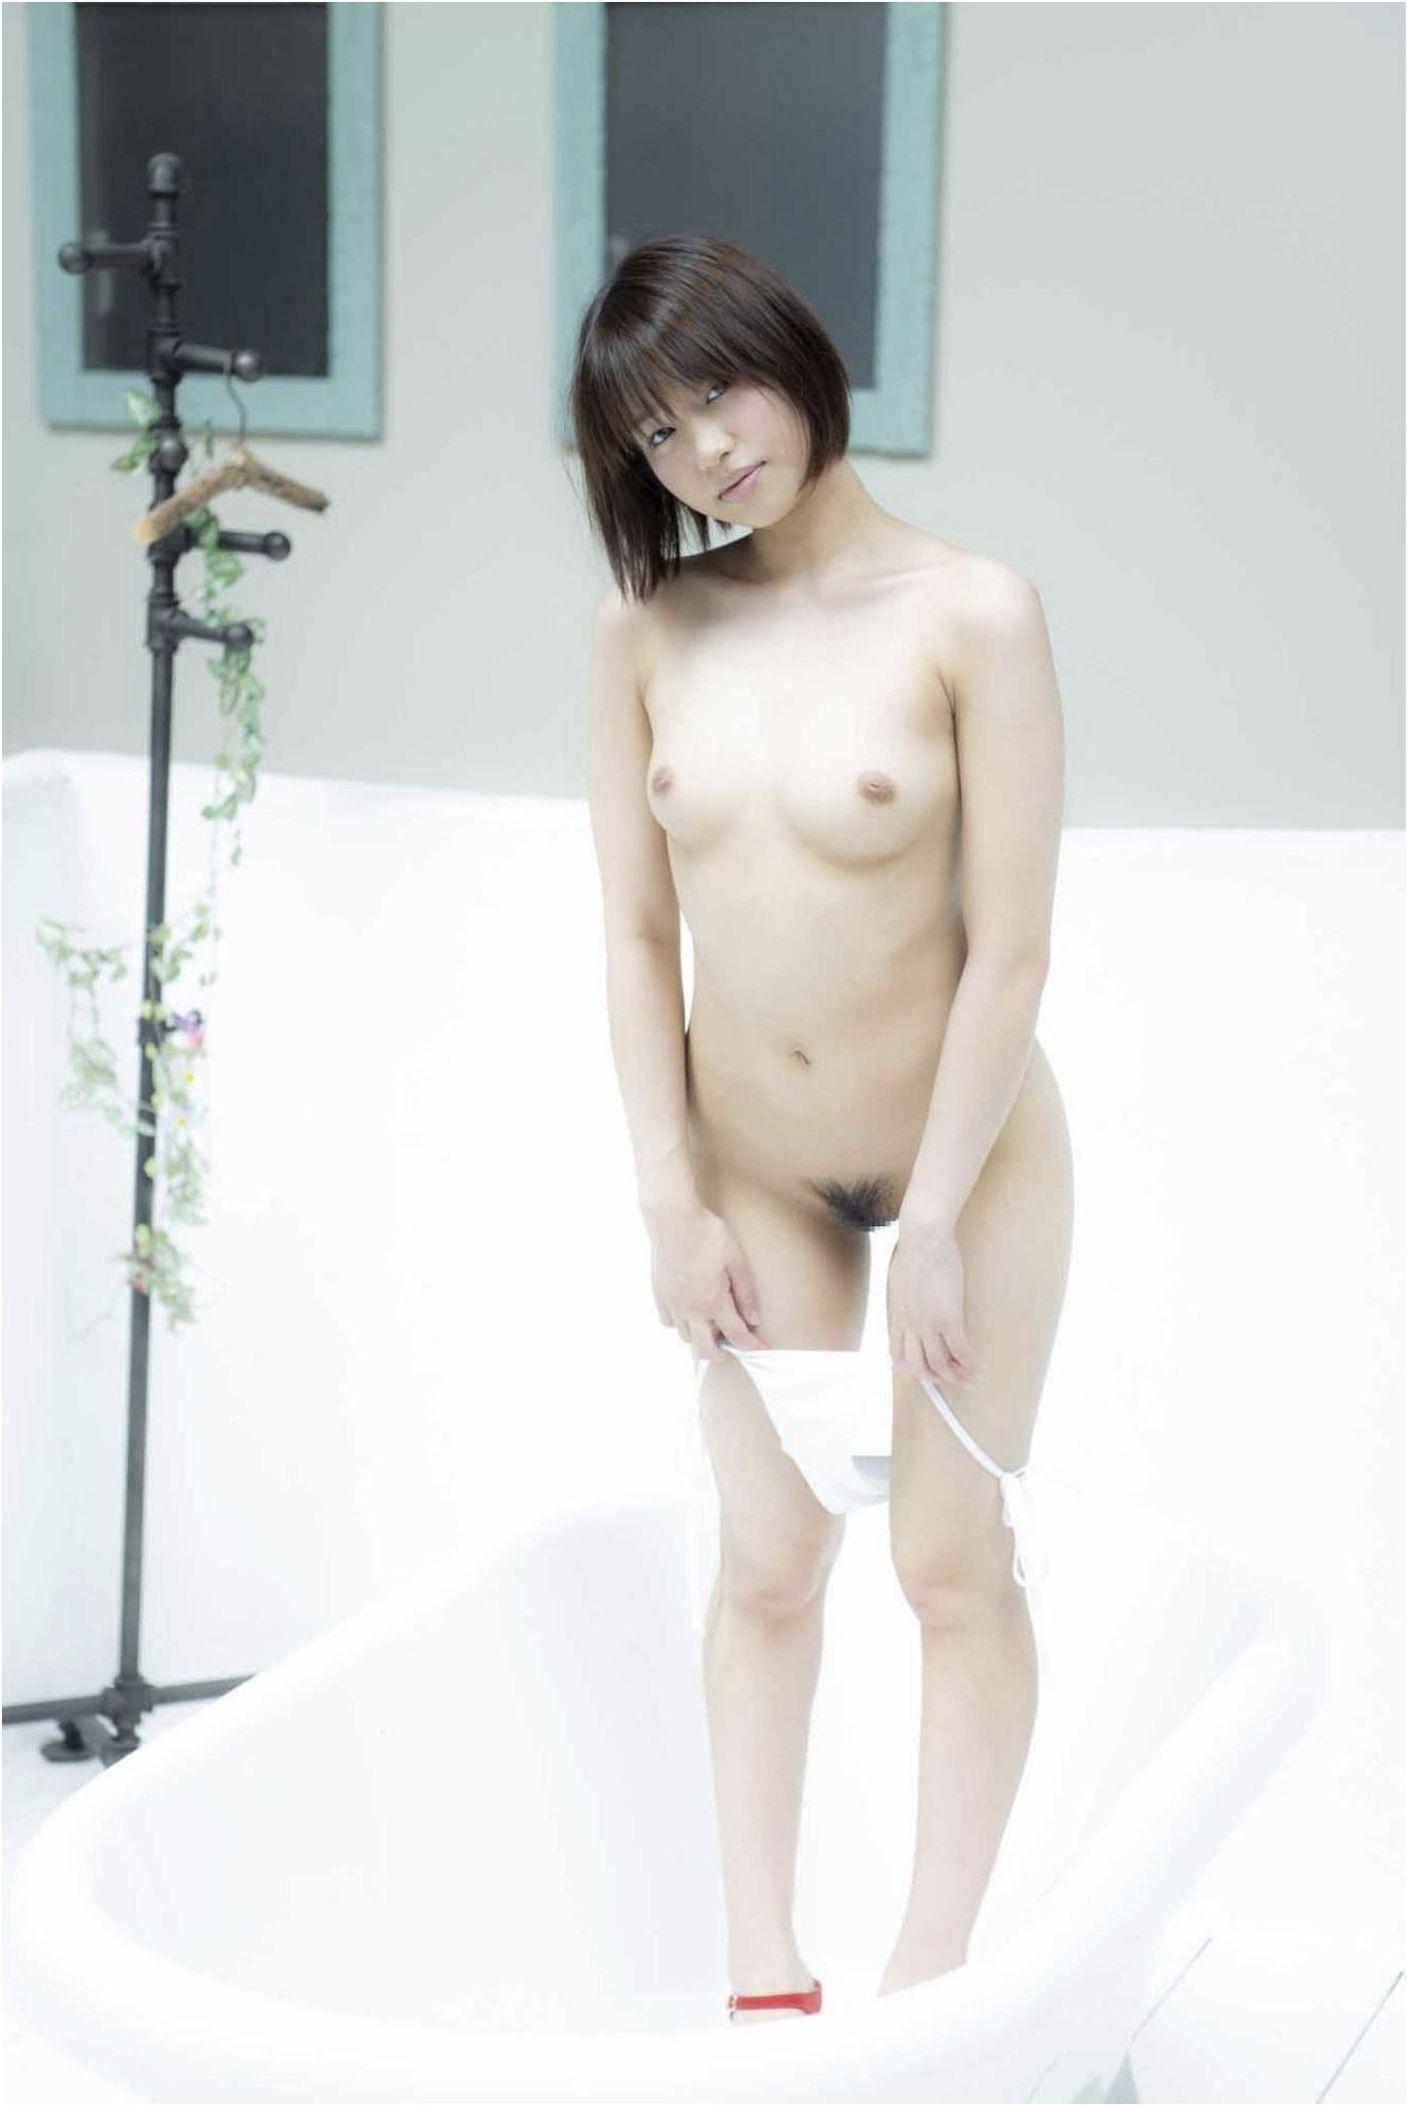 SOFT ON DEMAND GRAVURE COLLECTION 唯井まひろ01 photo 085